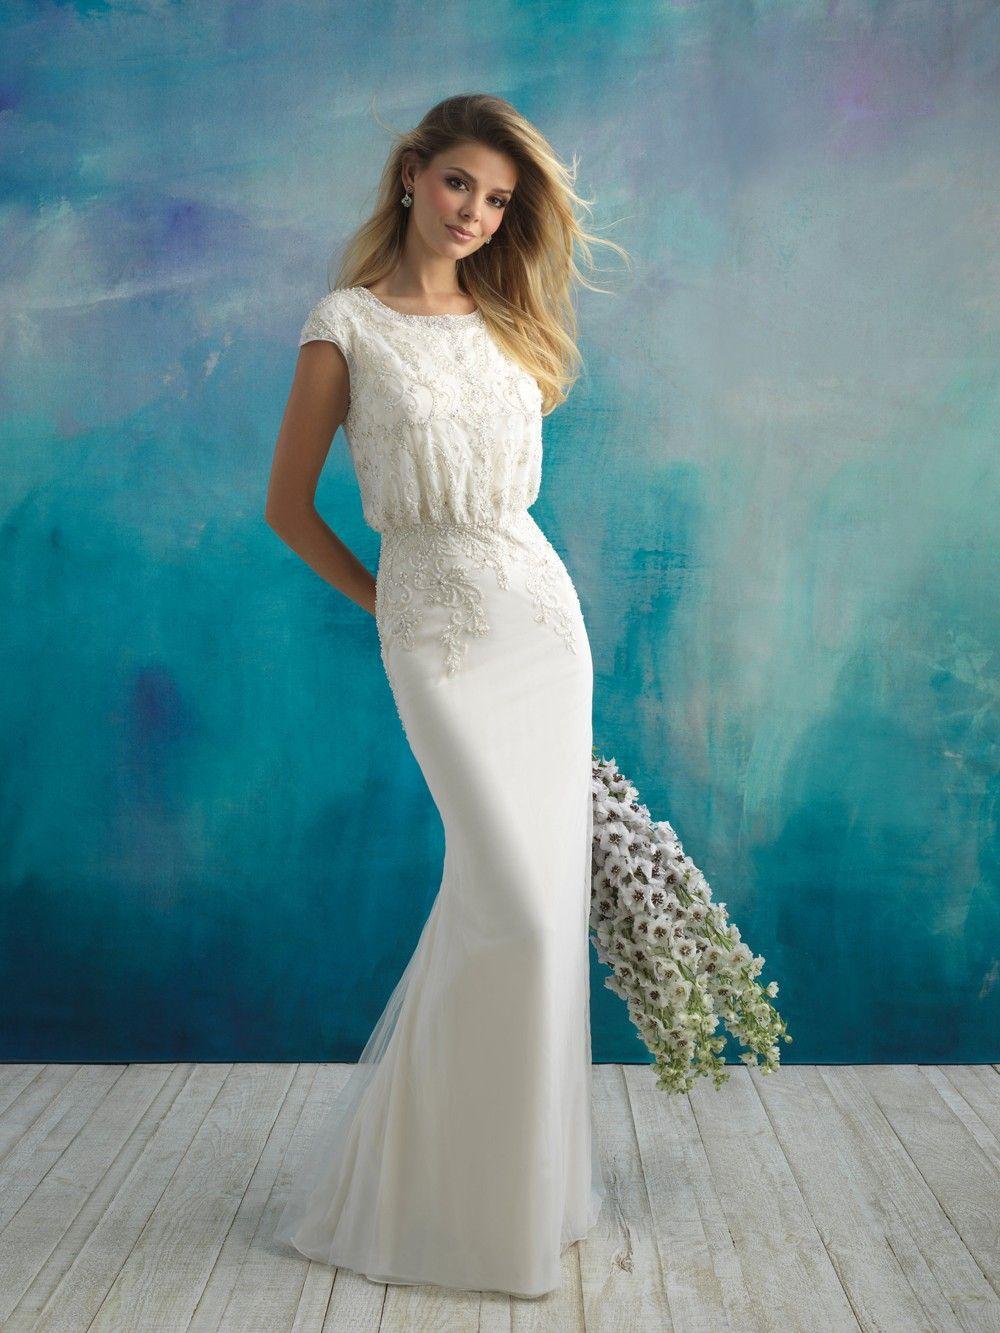 Pin by Lauren Whitmore on My Wedding | Pinterest | Allure bridal ...